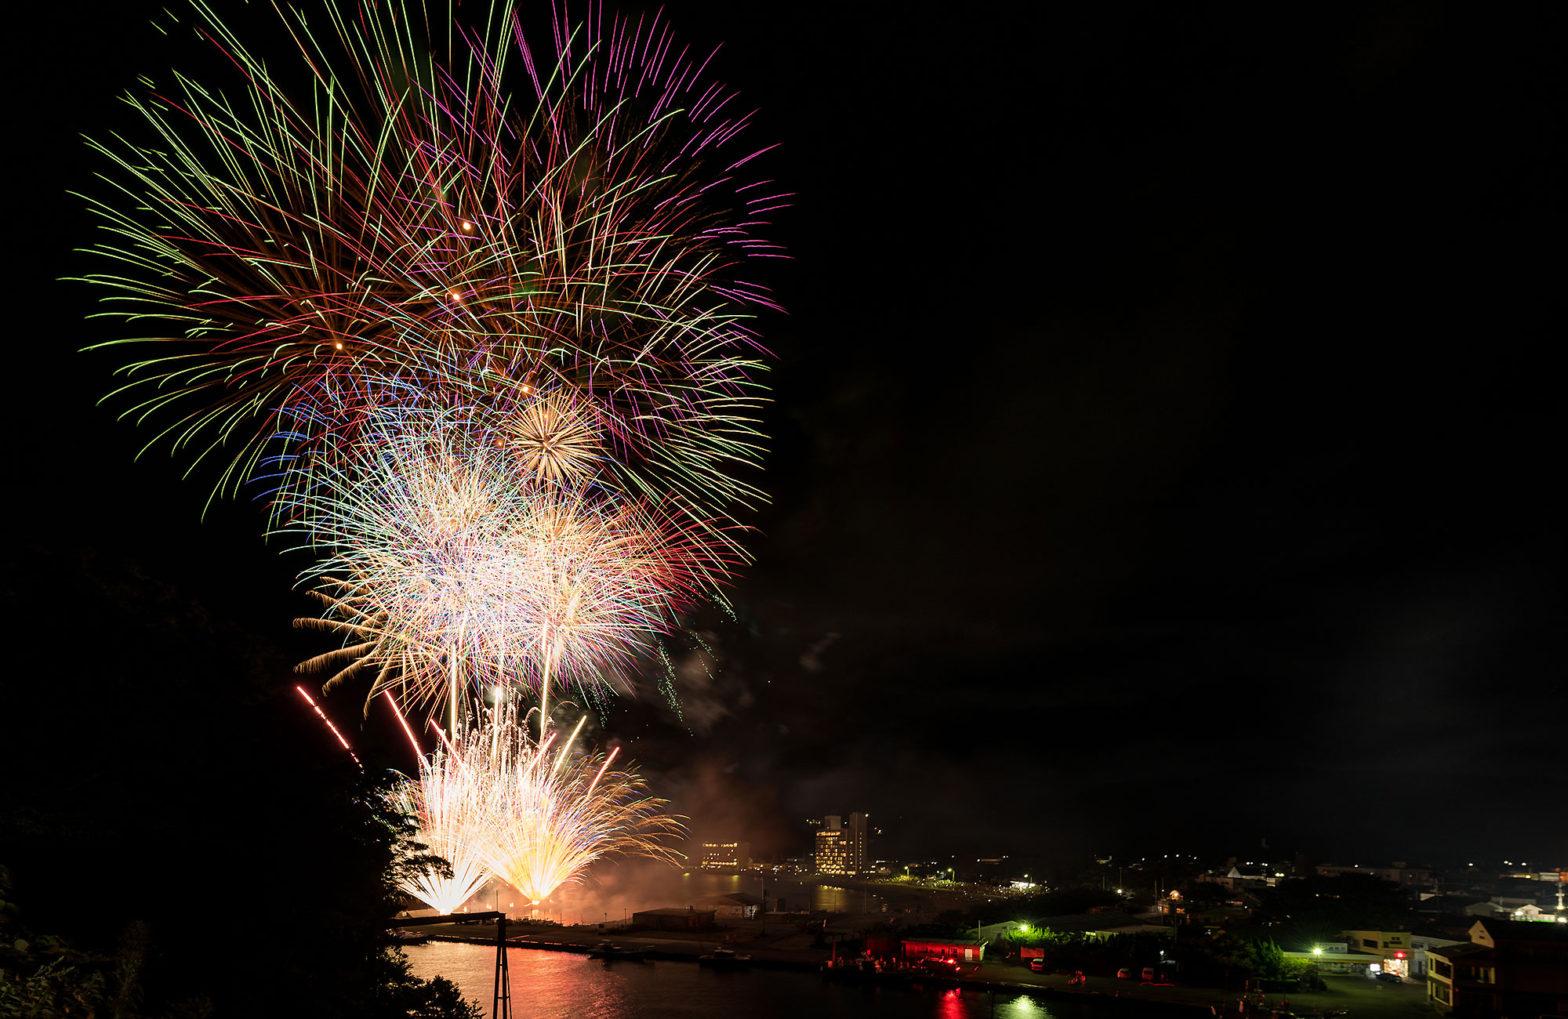 Matsuzaki Summer Festival Fireworks